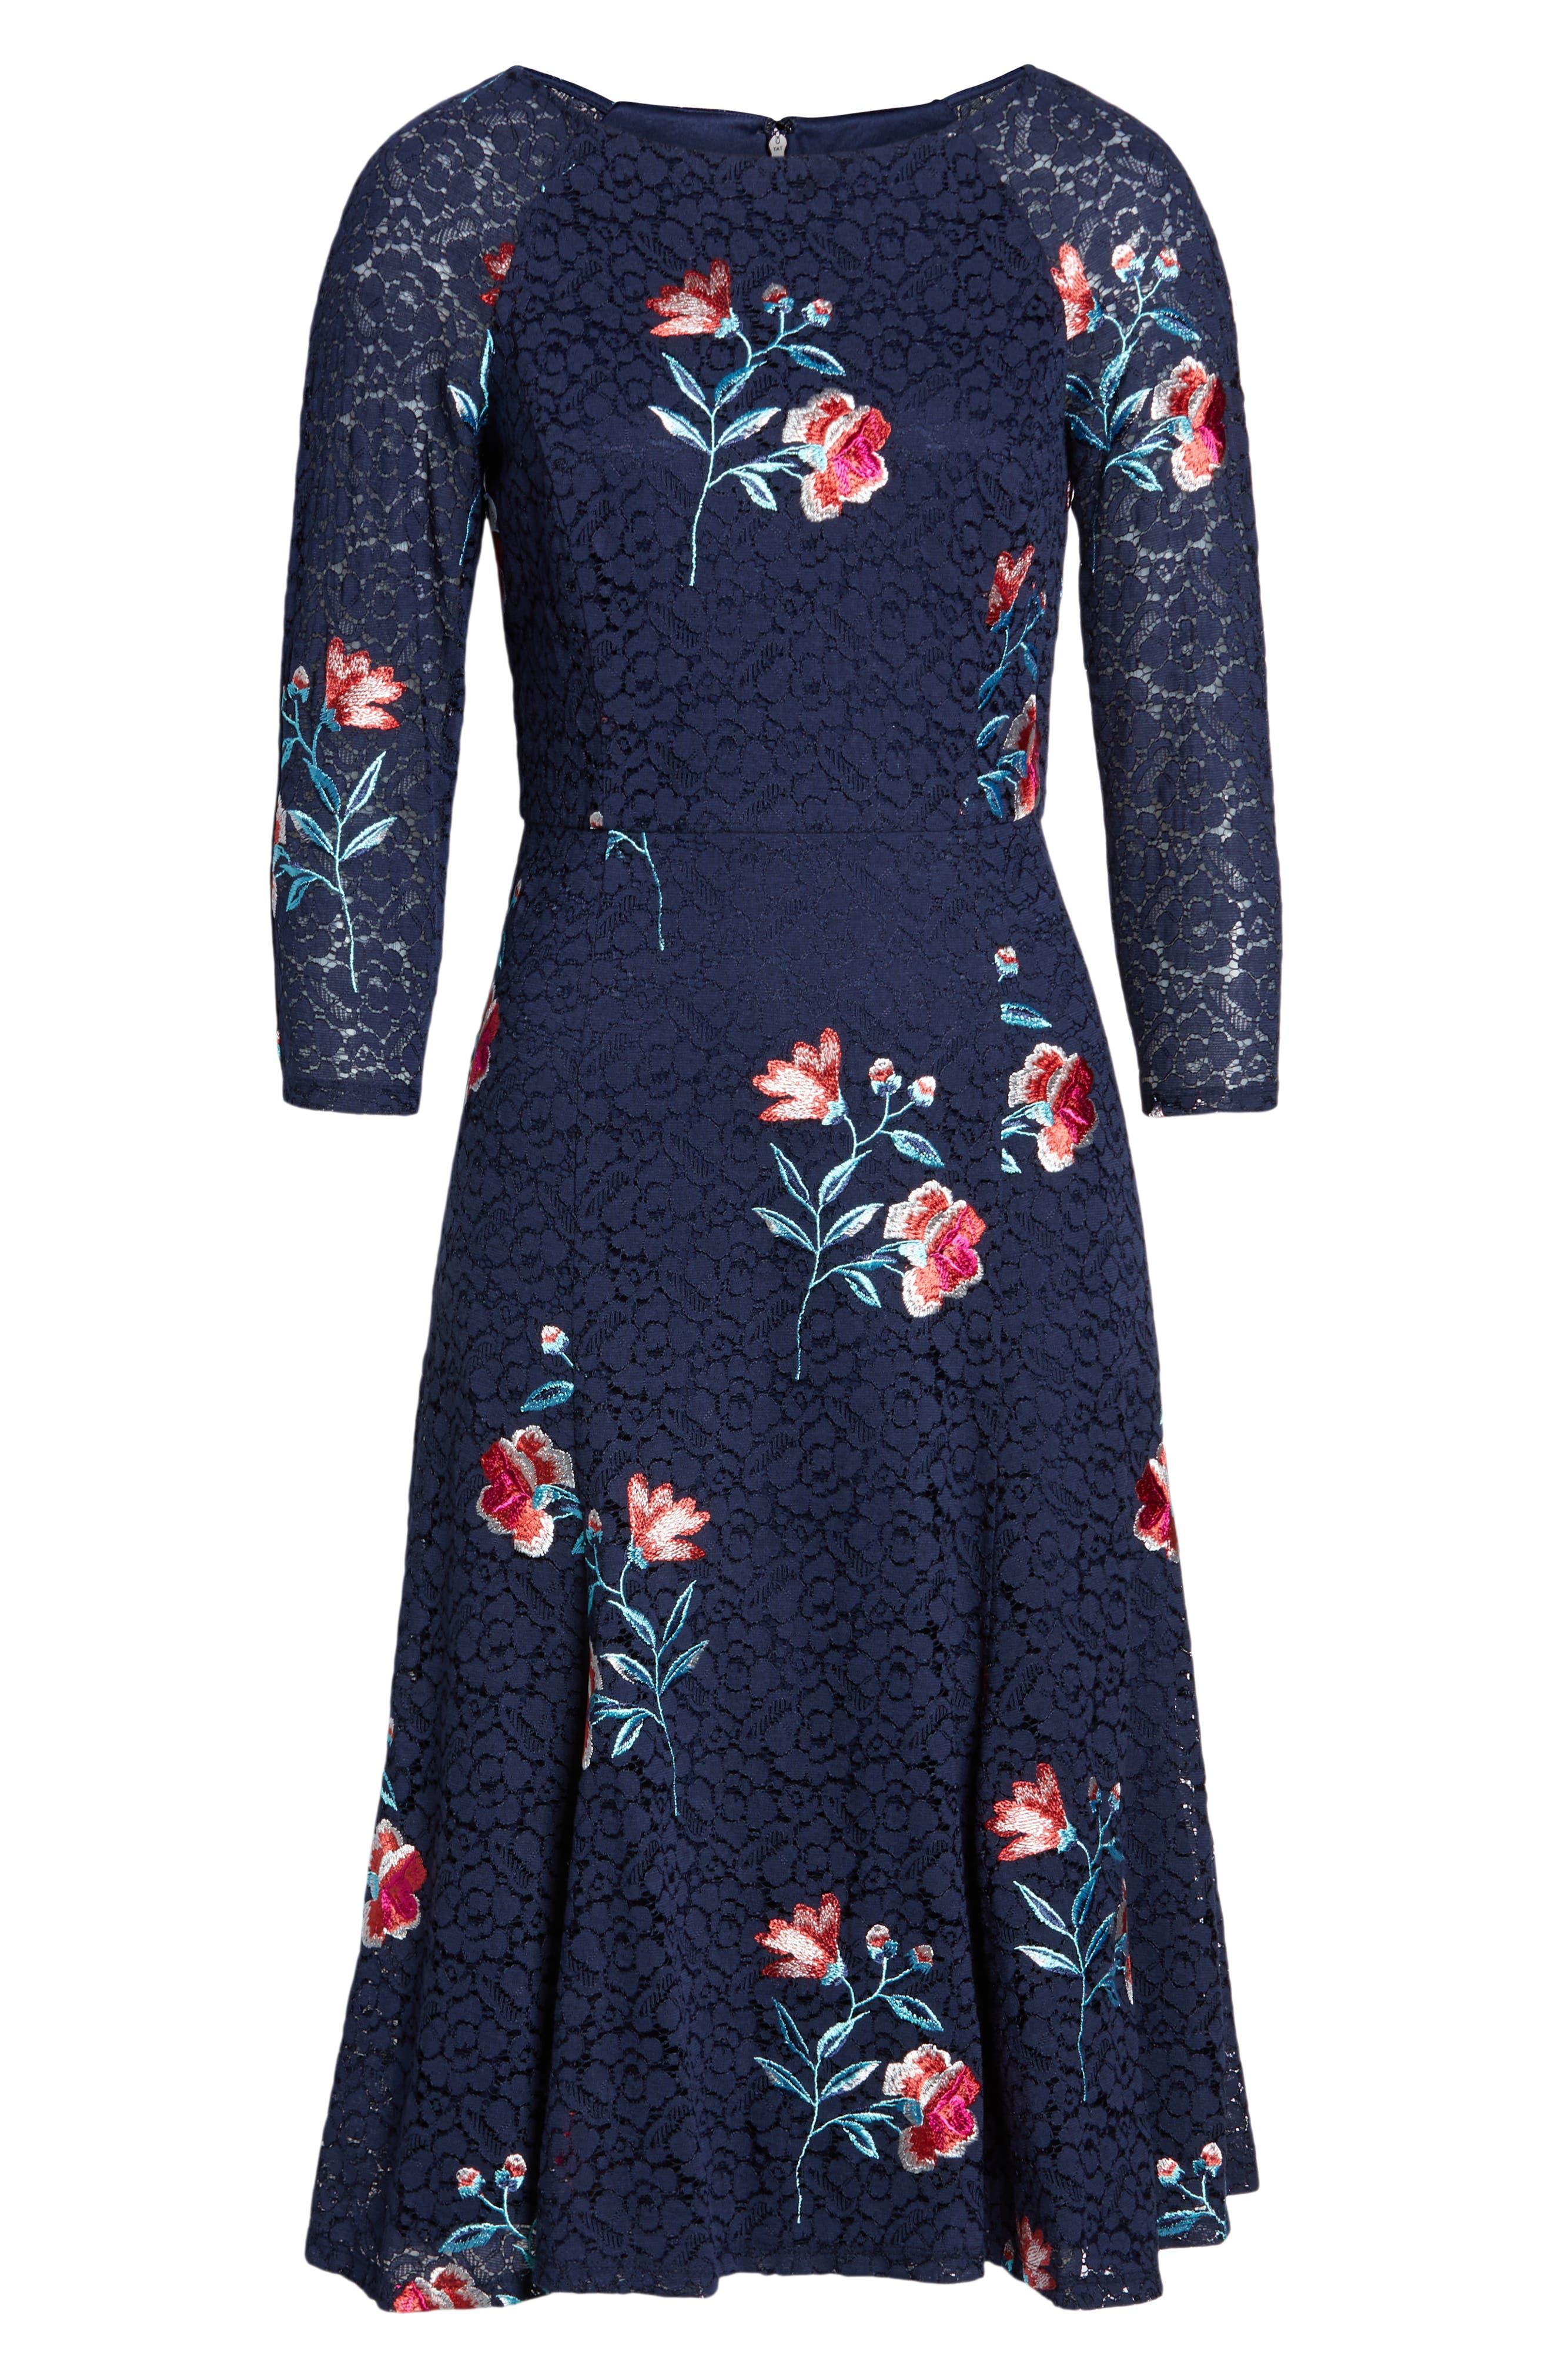 ELIZA J, Embroidery & Lace A-Line Dress, Alternate thumbnail 7, color, NAVY